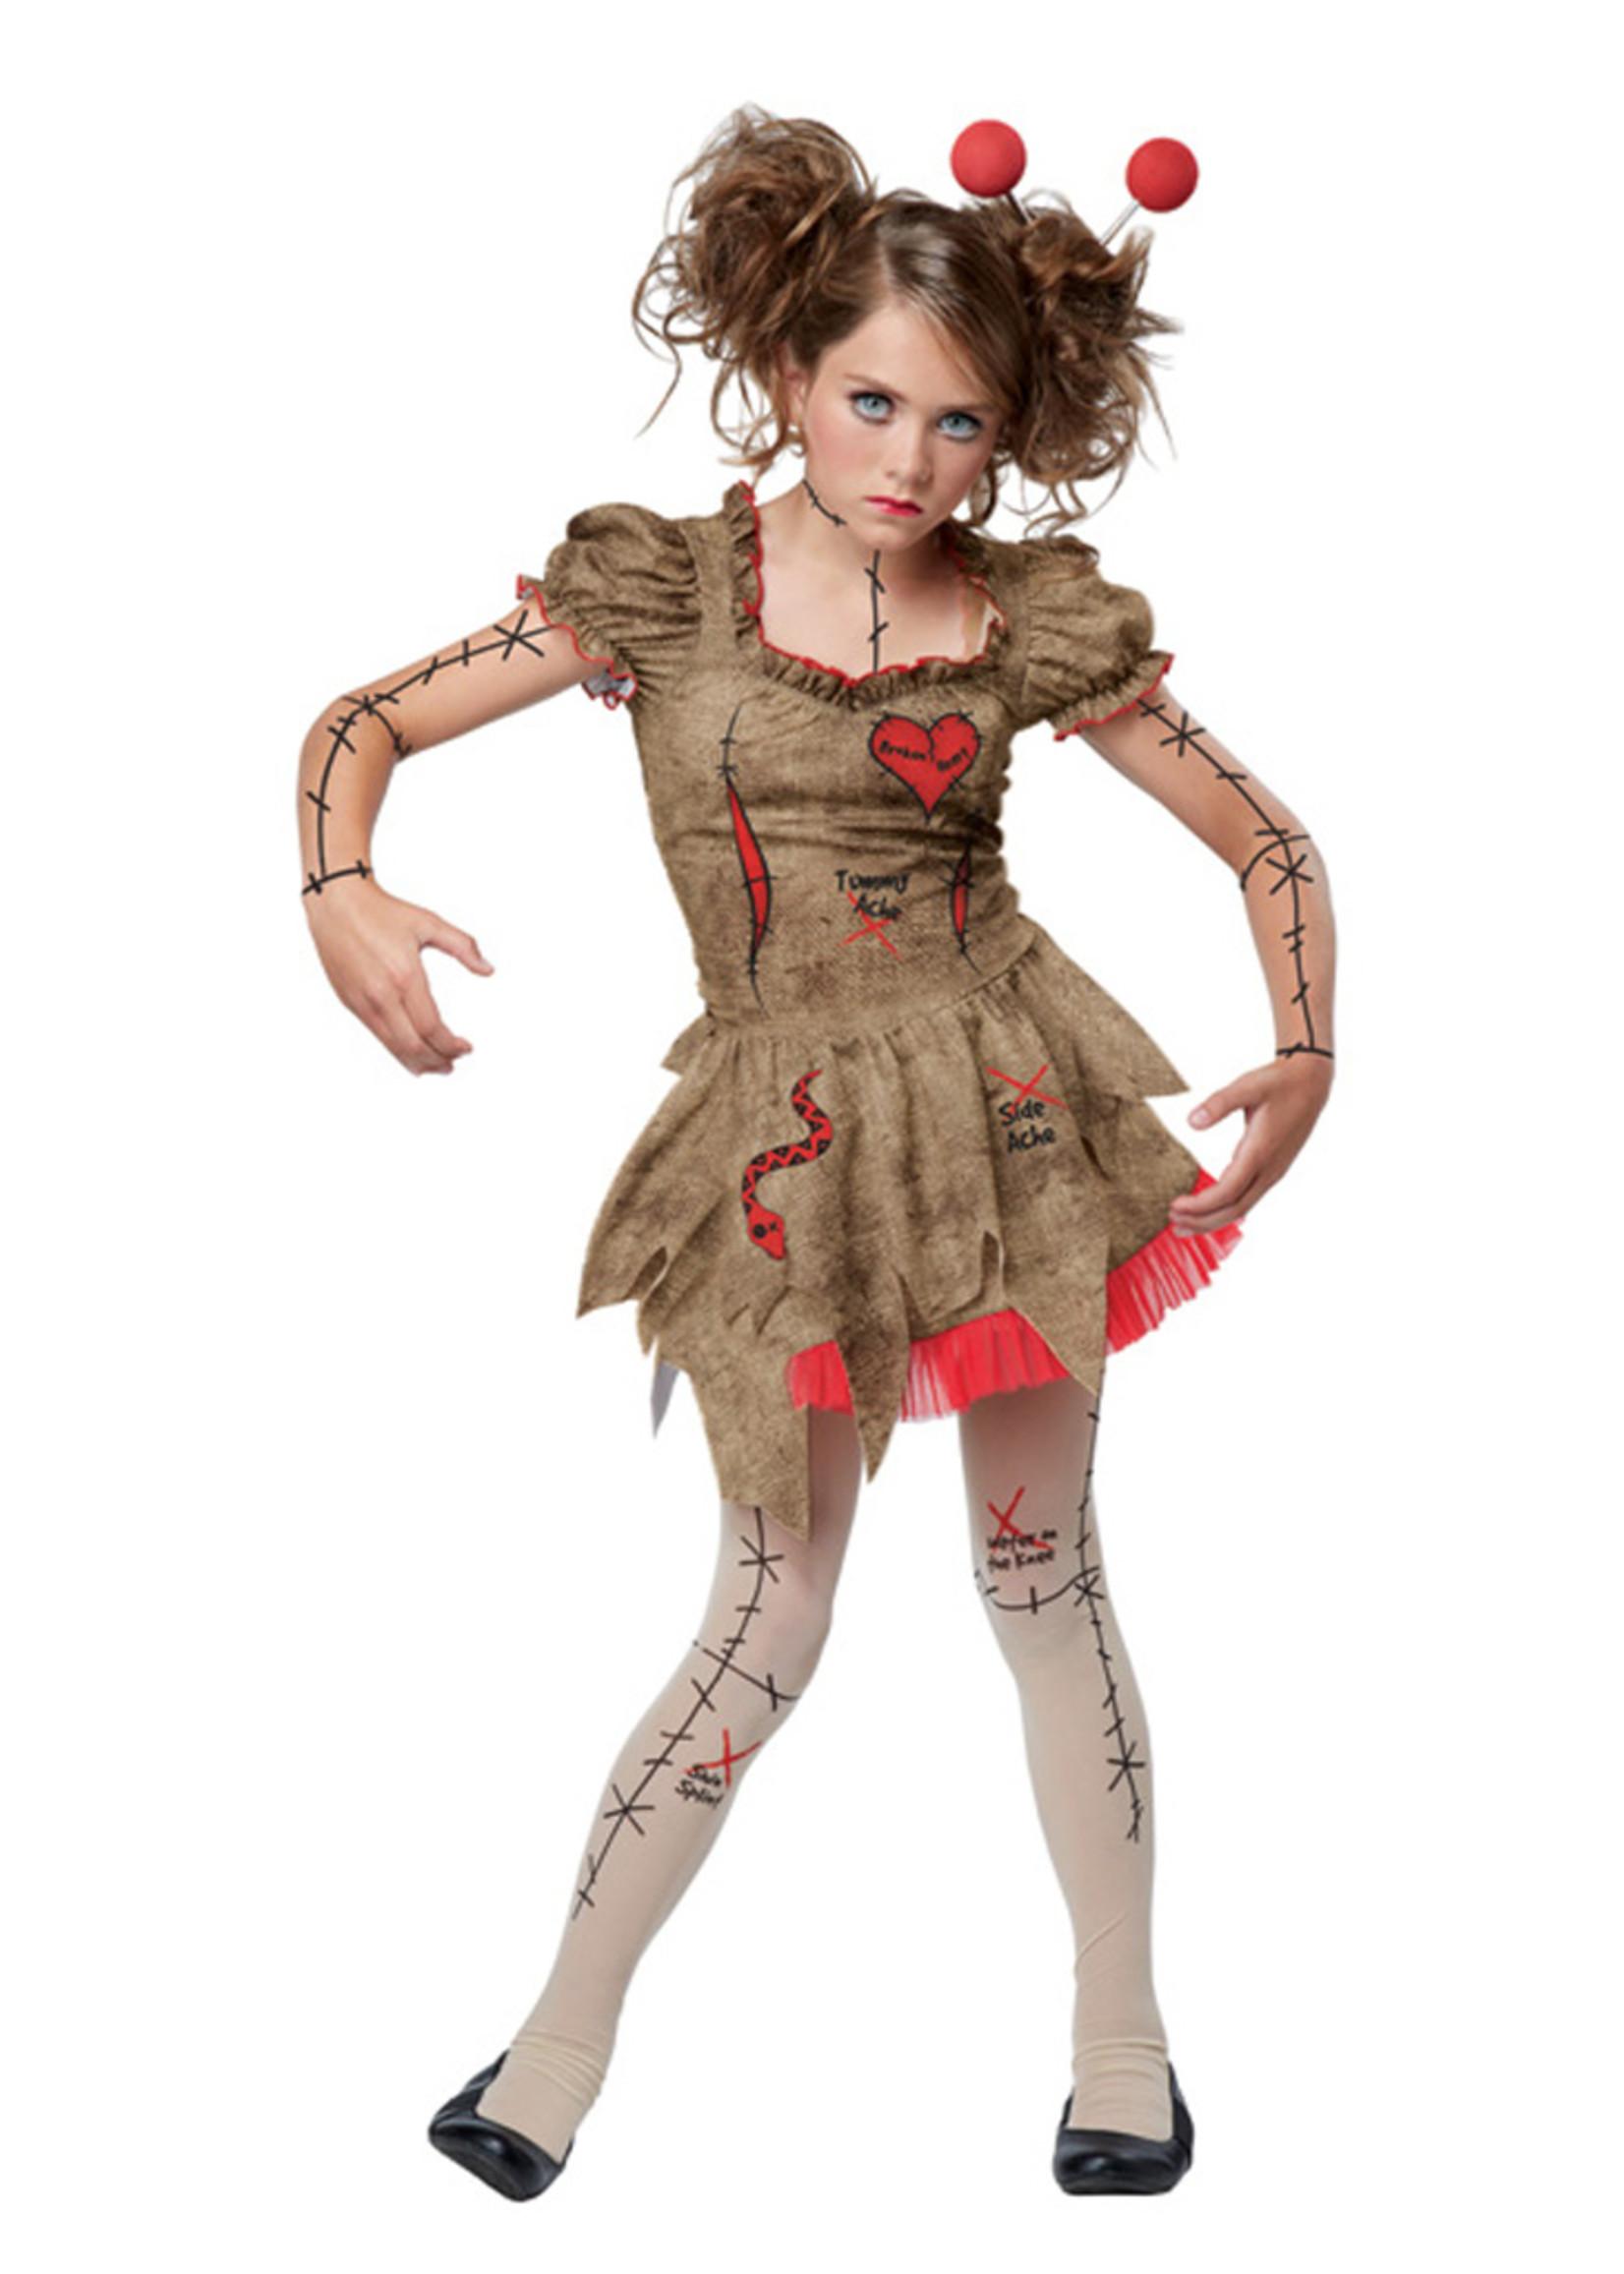 Voodoo Dolly Costume - Girls